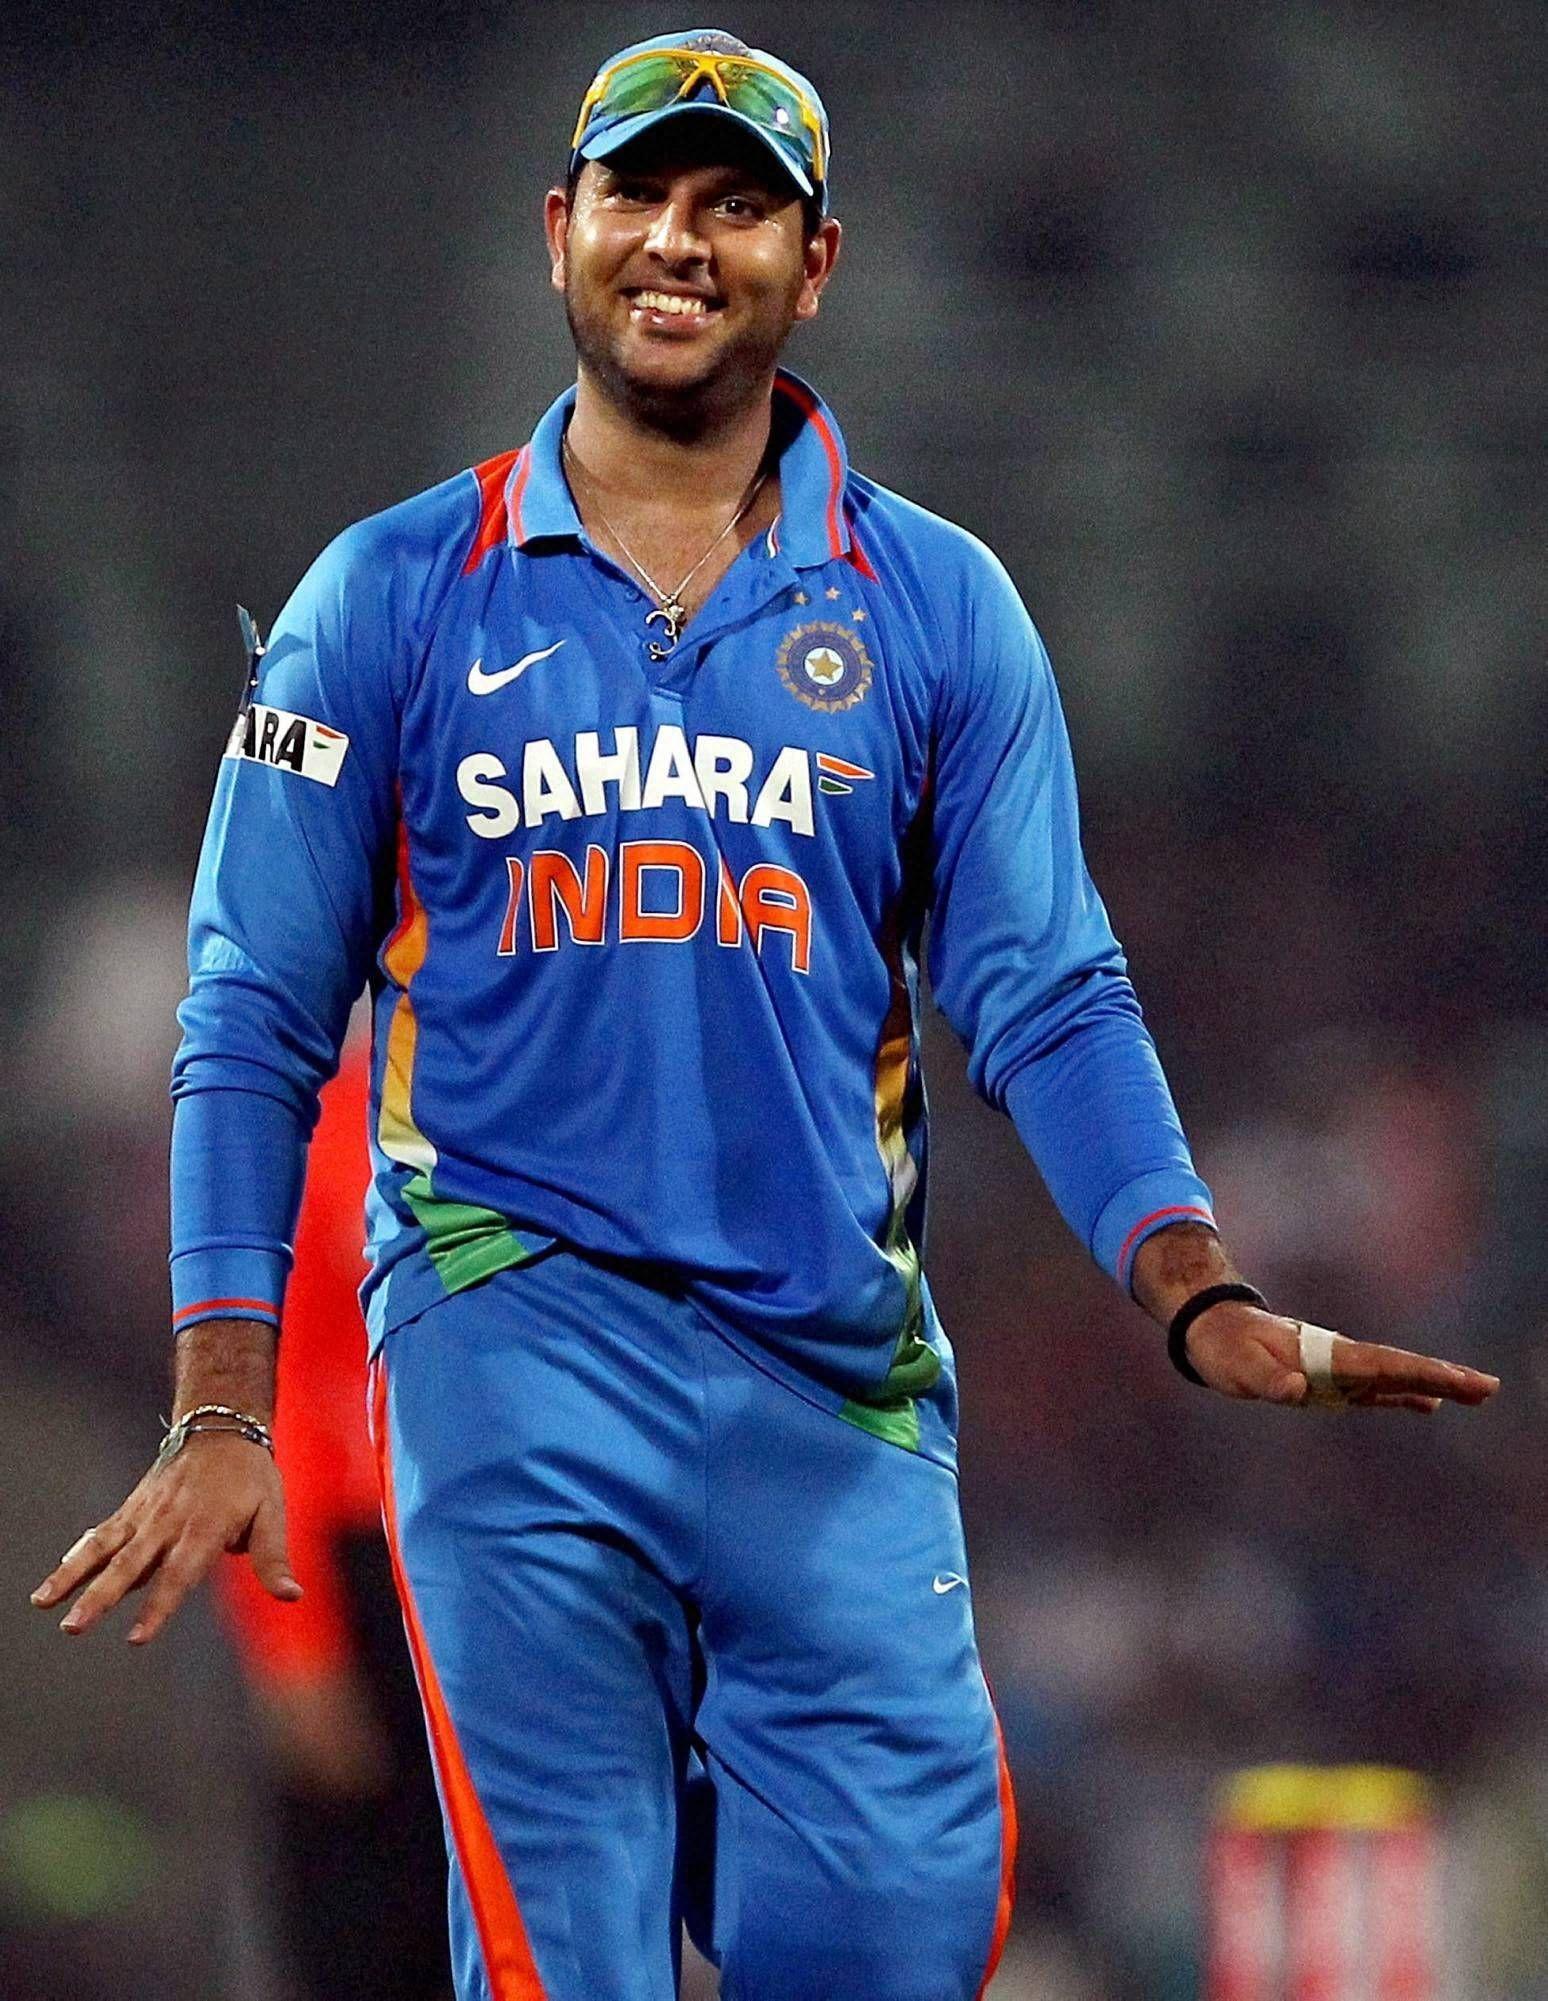 Yuvraj Singh Wallpapers Ipl Wallpapers Yuvraj Singh Singh India Cricket Team